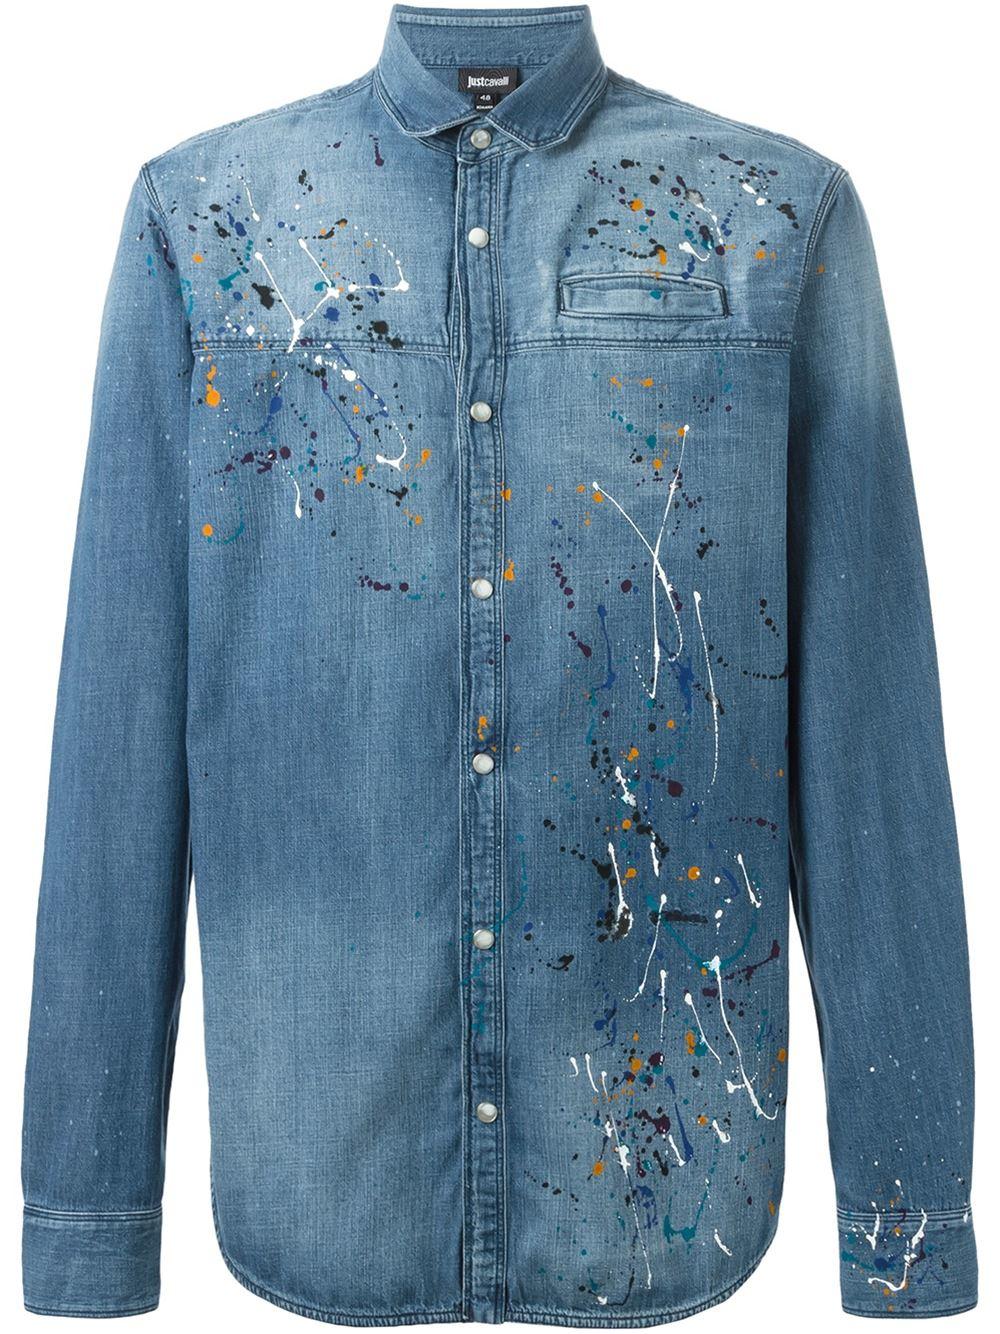 Lyst Just Cavalli Paint Splatter Print Shirt In Blue For Men